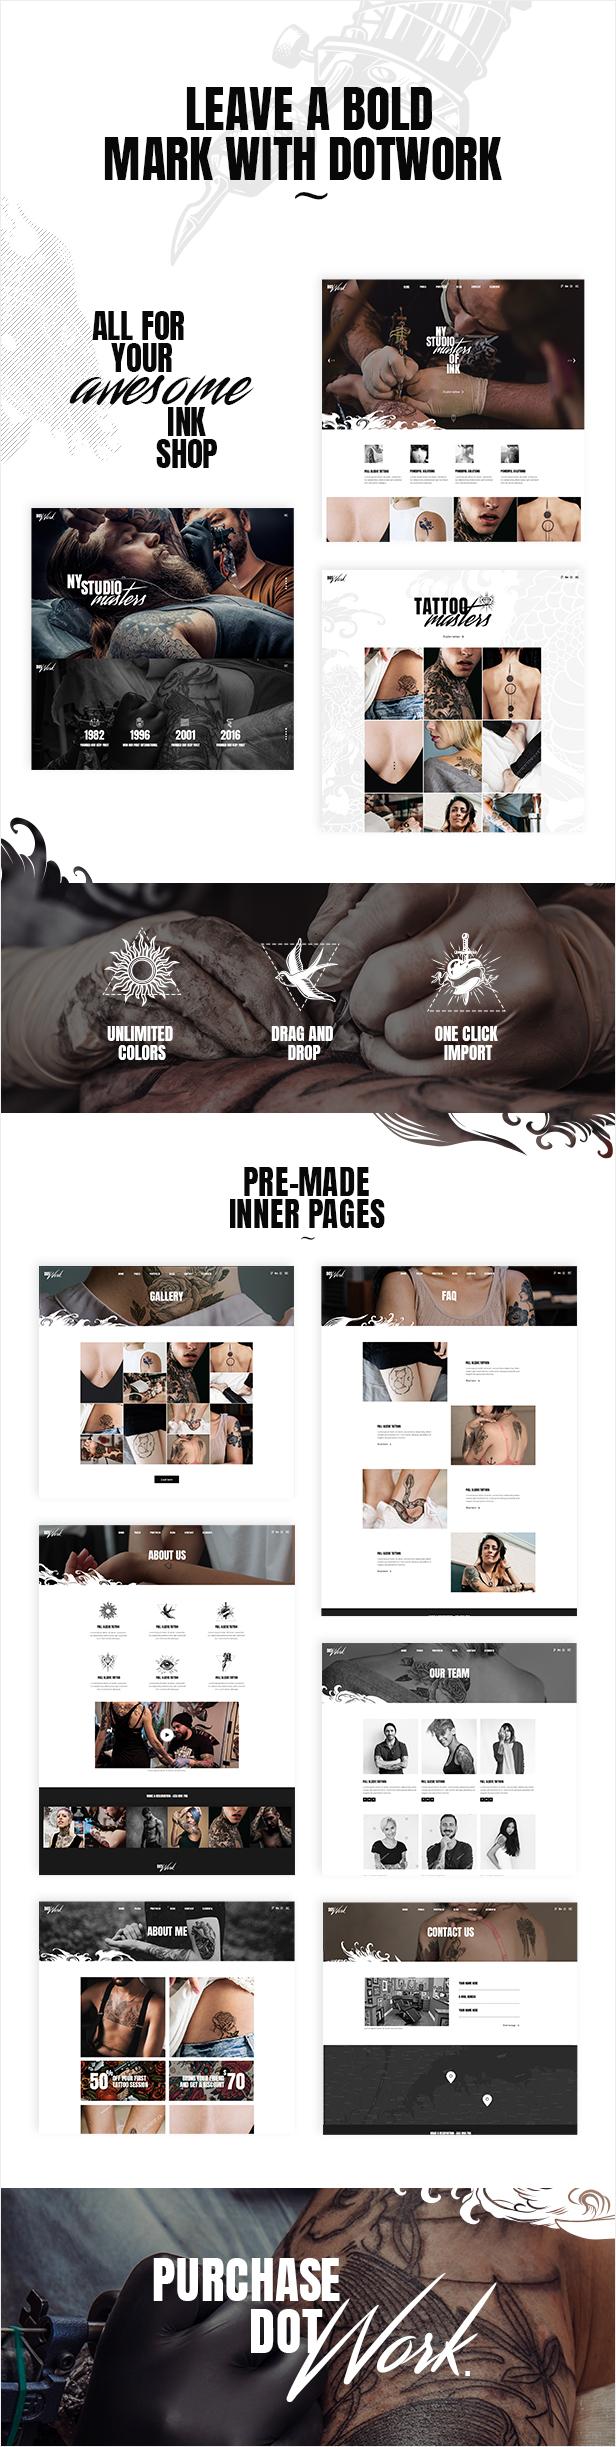 Dotwork - Tattoo Studio and Piercing Shop Theme - 1